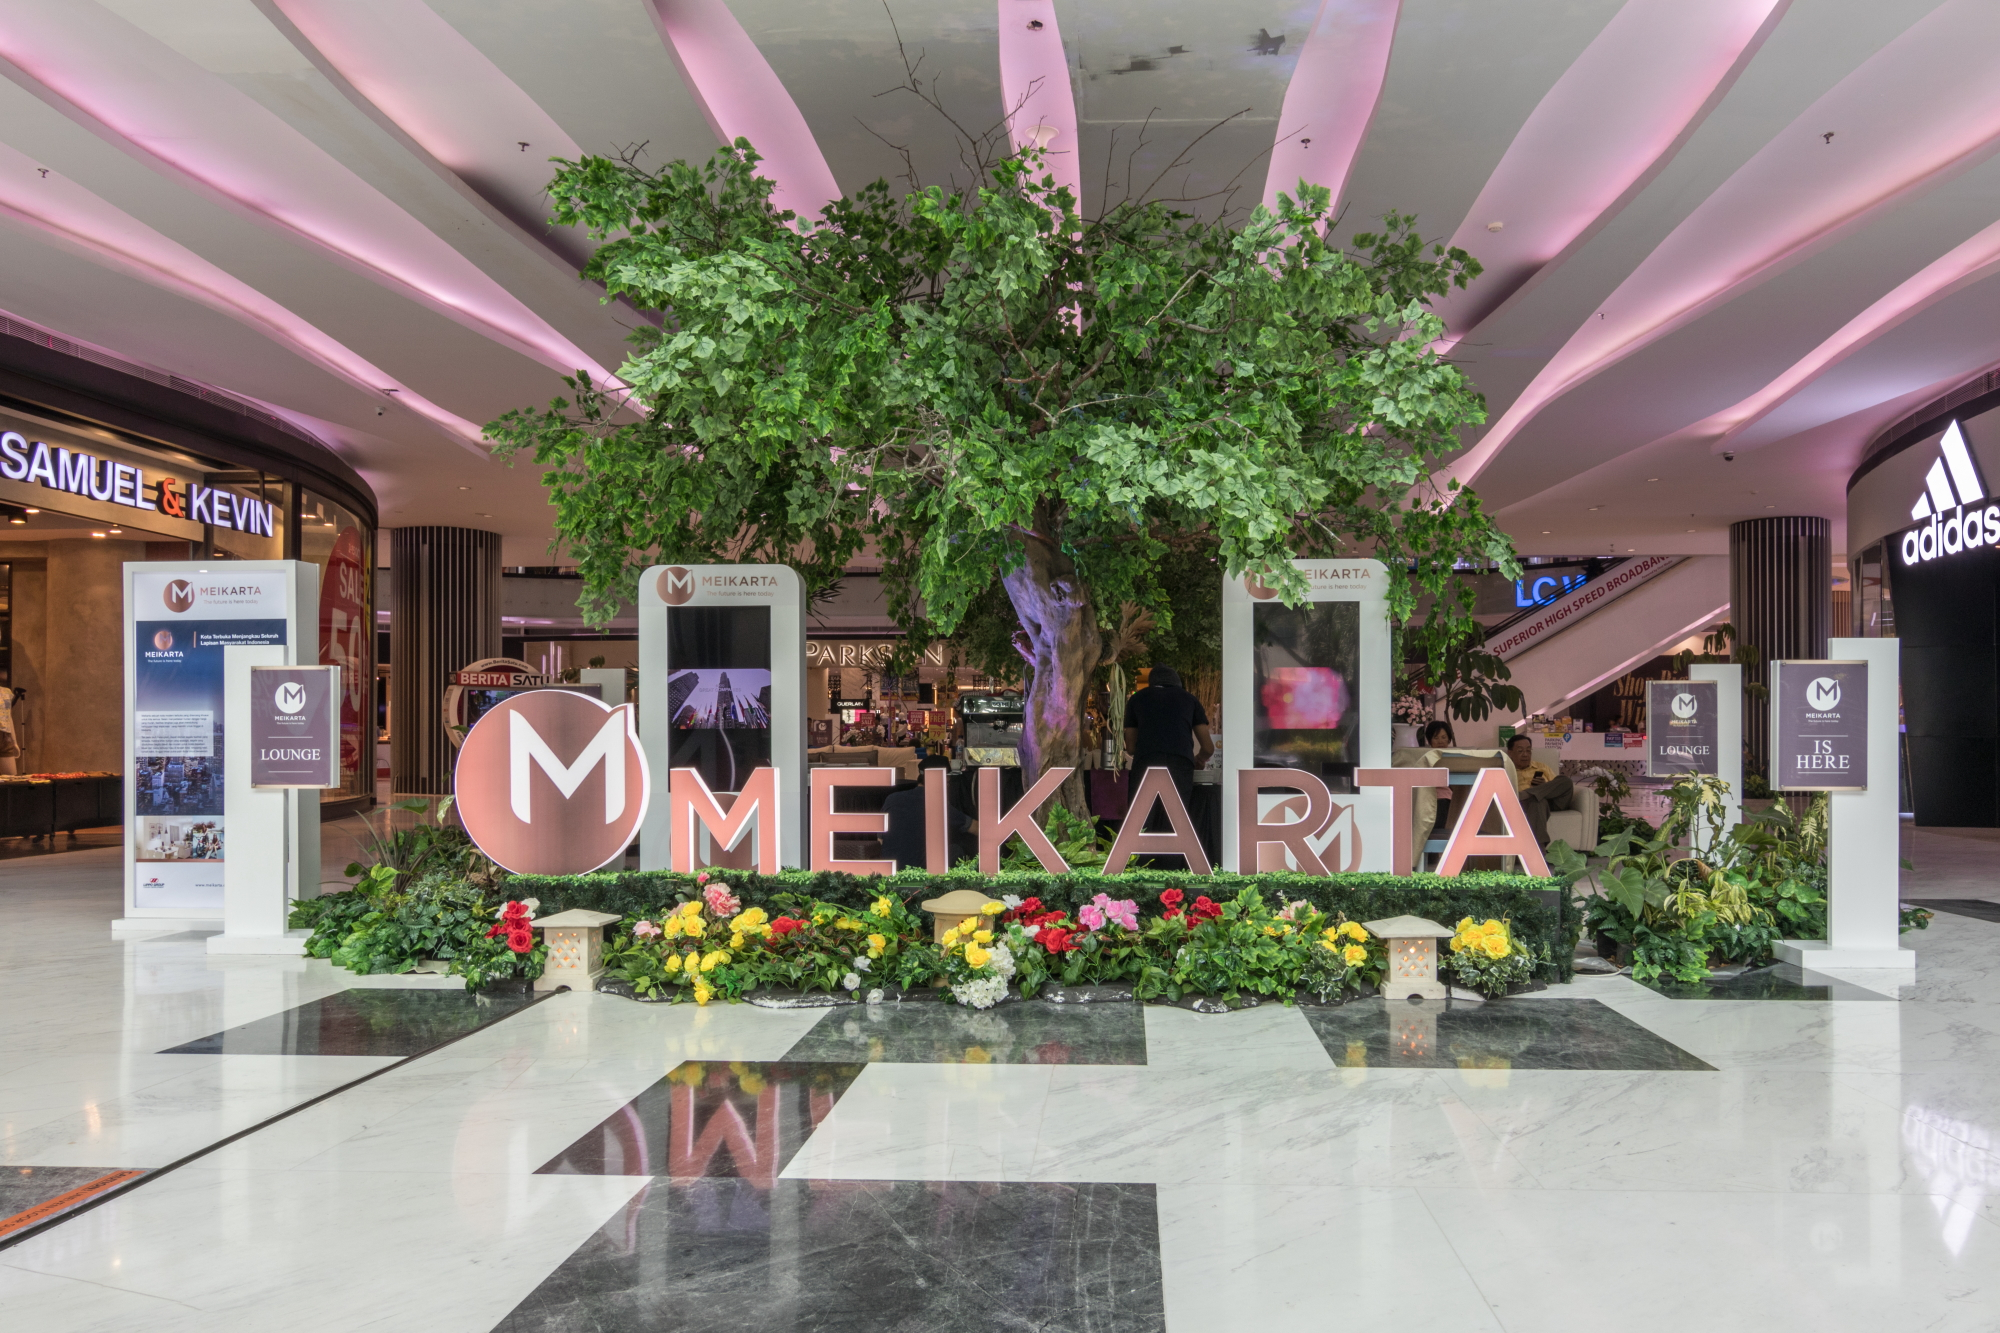 Meikarta Show Unit (Lippo Malls)